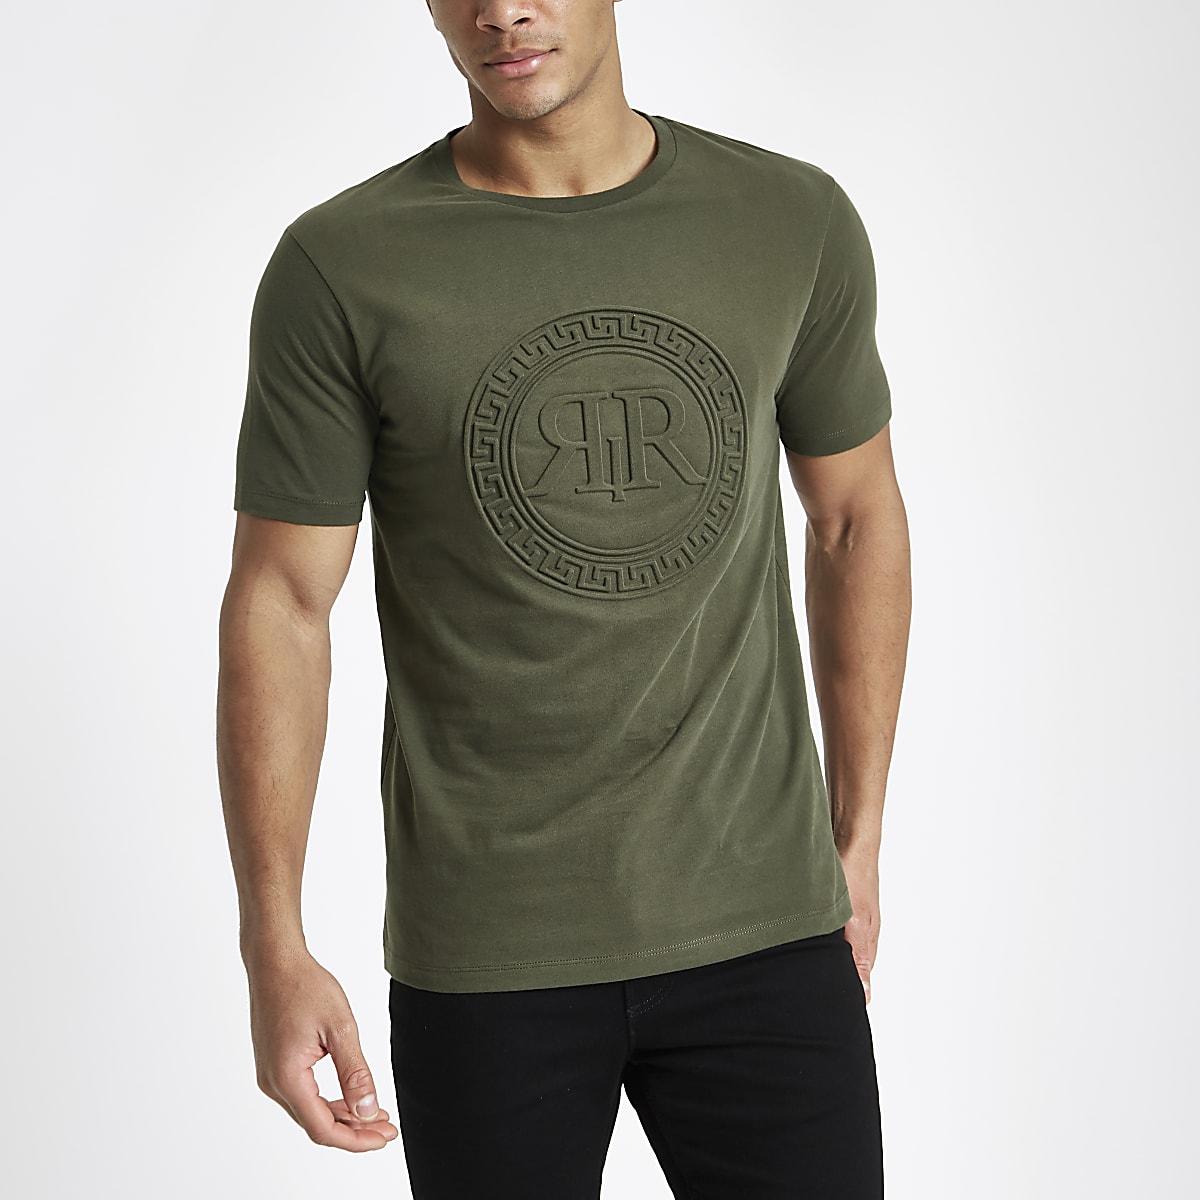 Kakigroen slim-fit T-shirt met RI-logo in reliëf